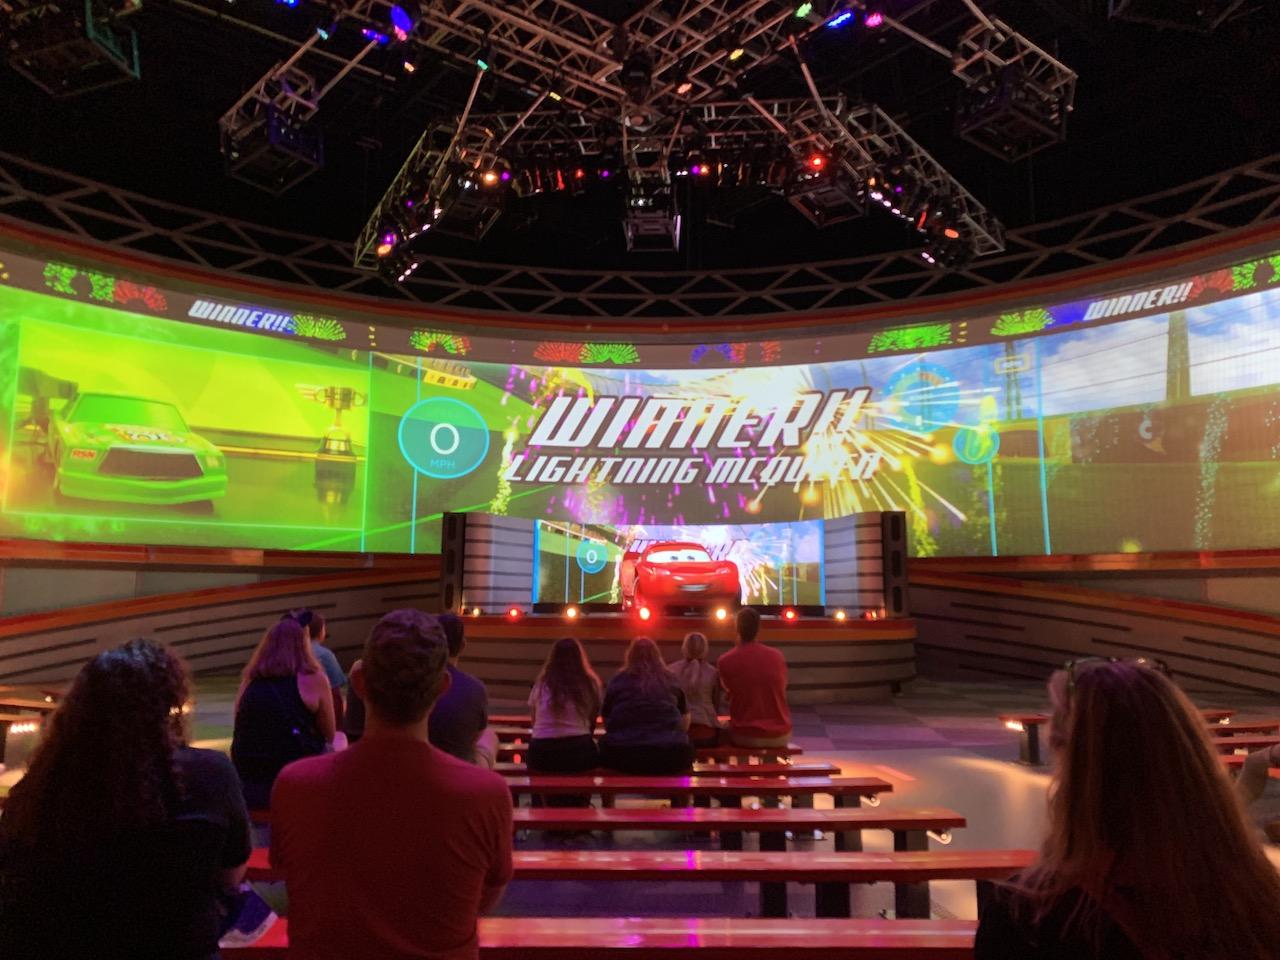 disney world hollywood studios rides entertainment lightning mcqueen.jpeg